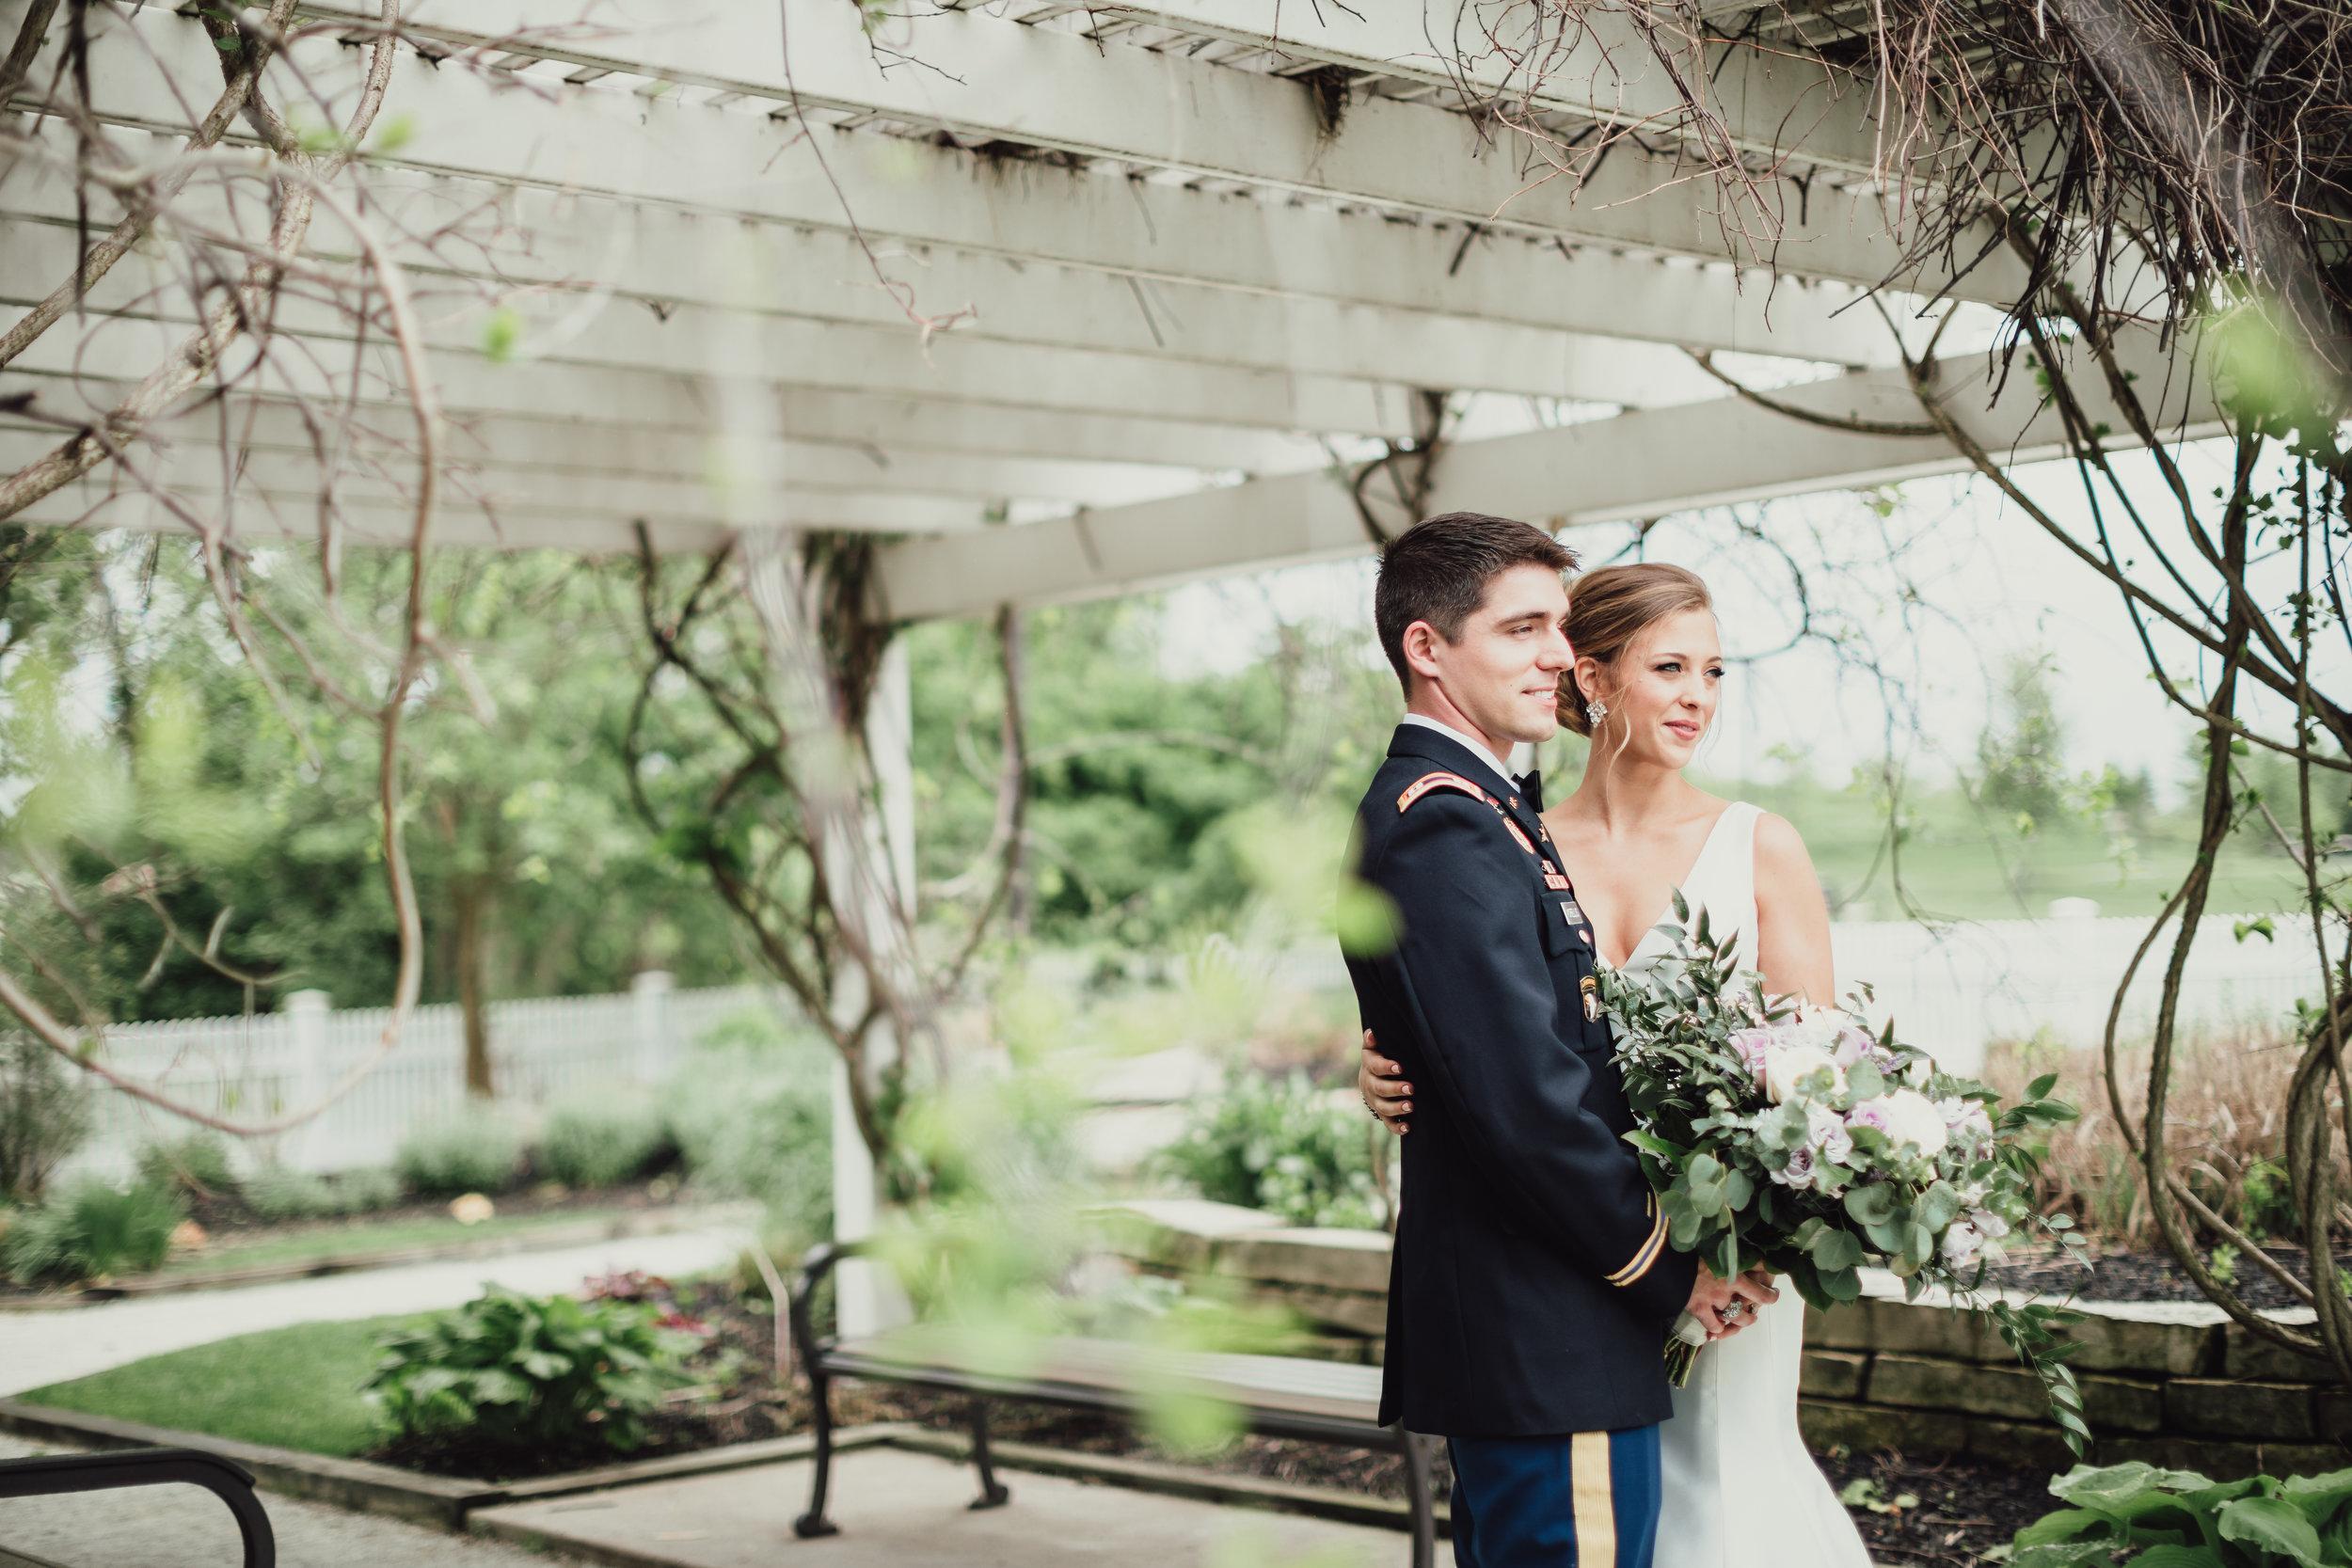 Centennial-Park-Munster-indiana-bride-and-groom-Lauren-ashley-studios-photography.jpg